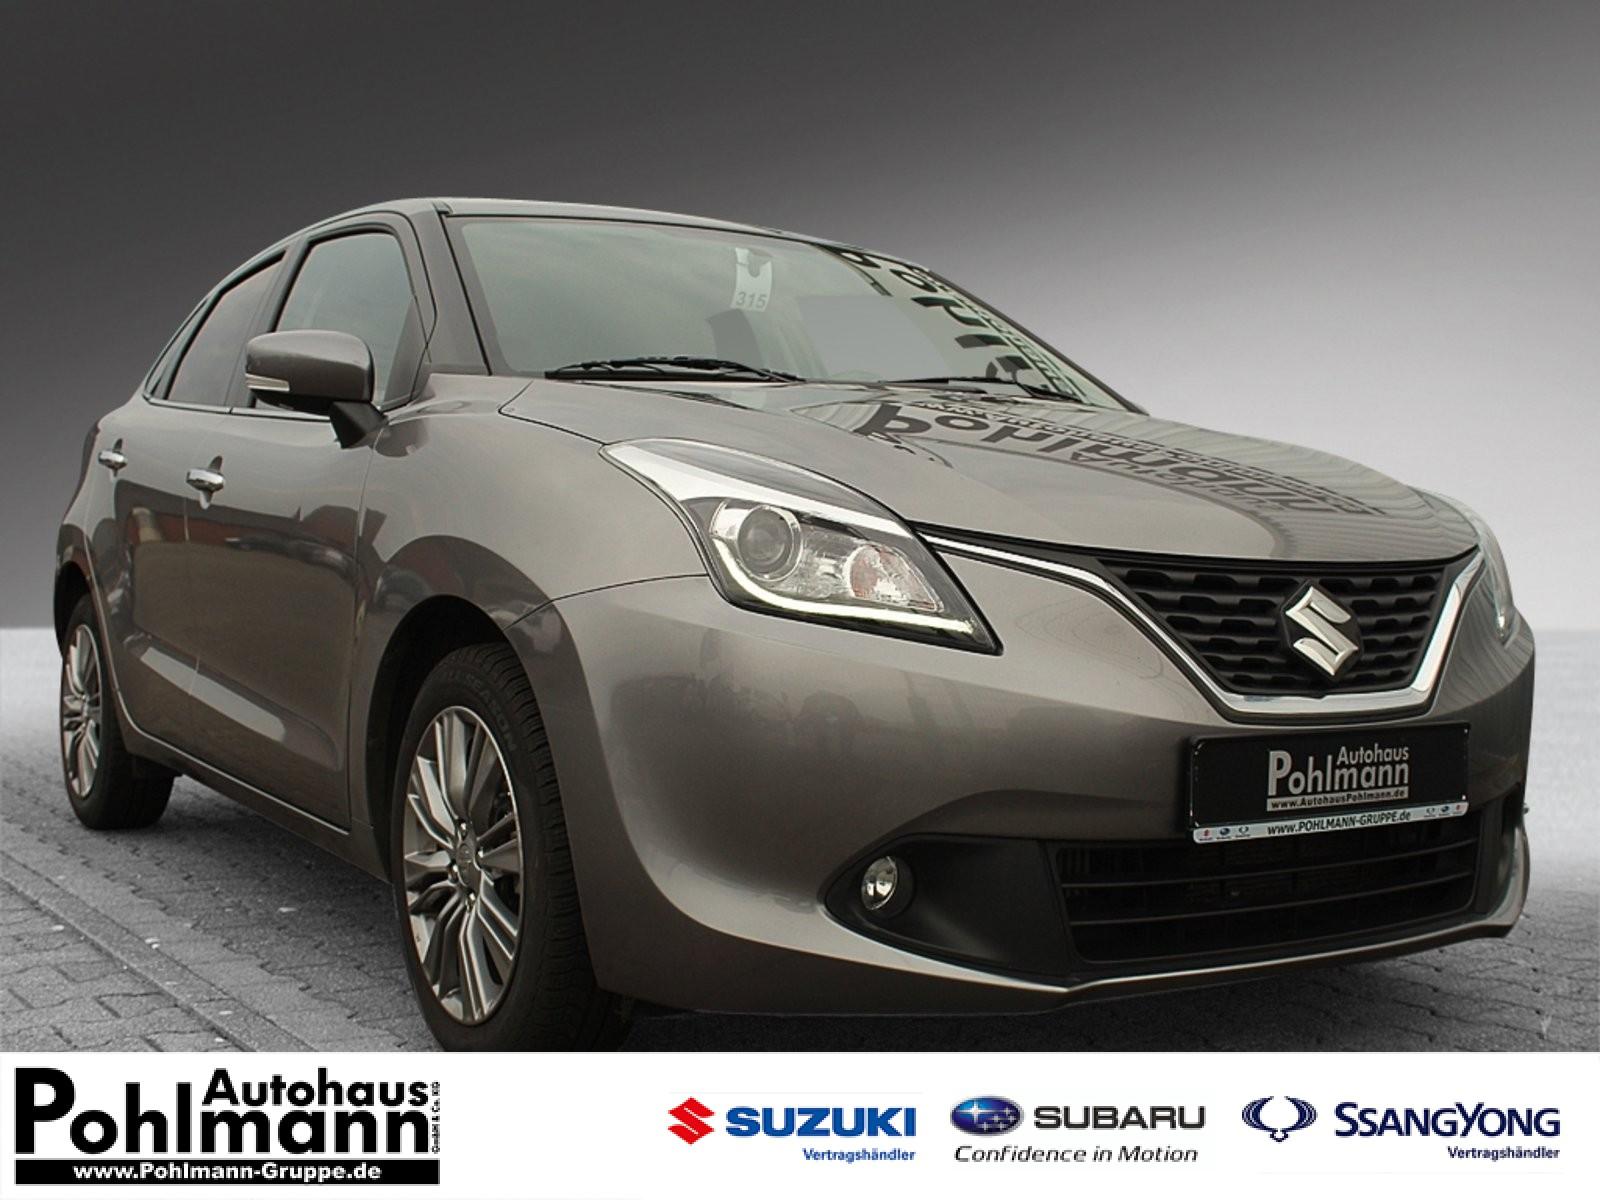 Suzuki Baleno Comfort 1.0 Automatik NAVI/KLIMAAUTOMATIC/ACC/SITZH/Rückfahrkamera, Jahr 2018, Benzin